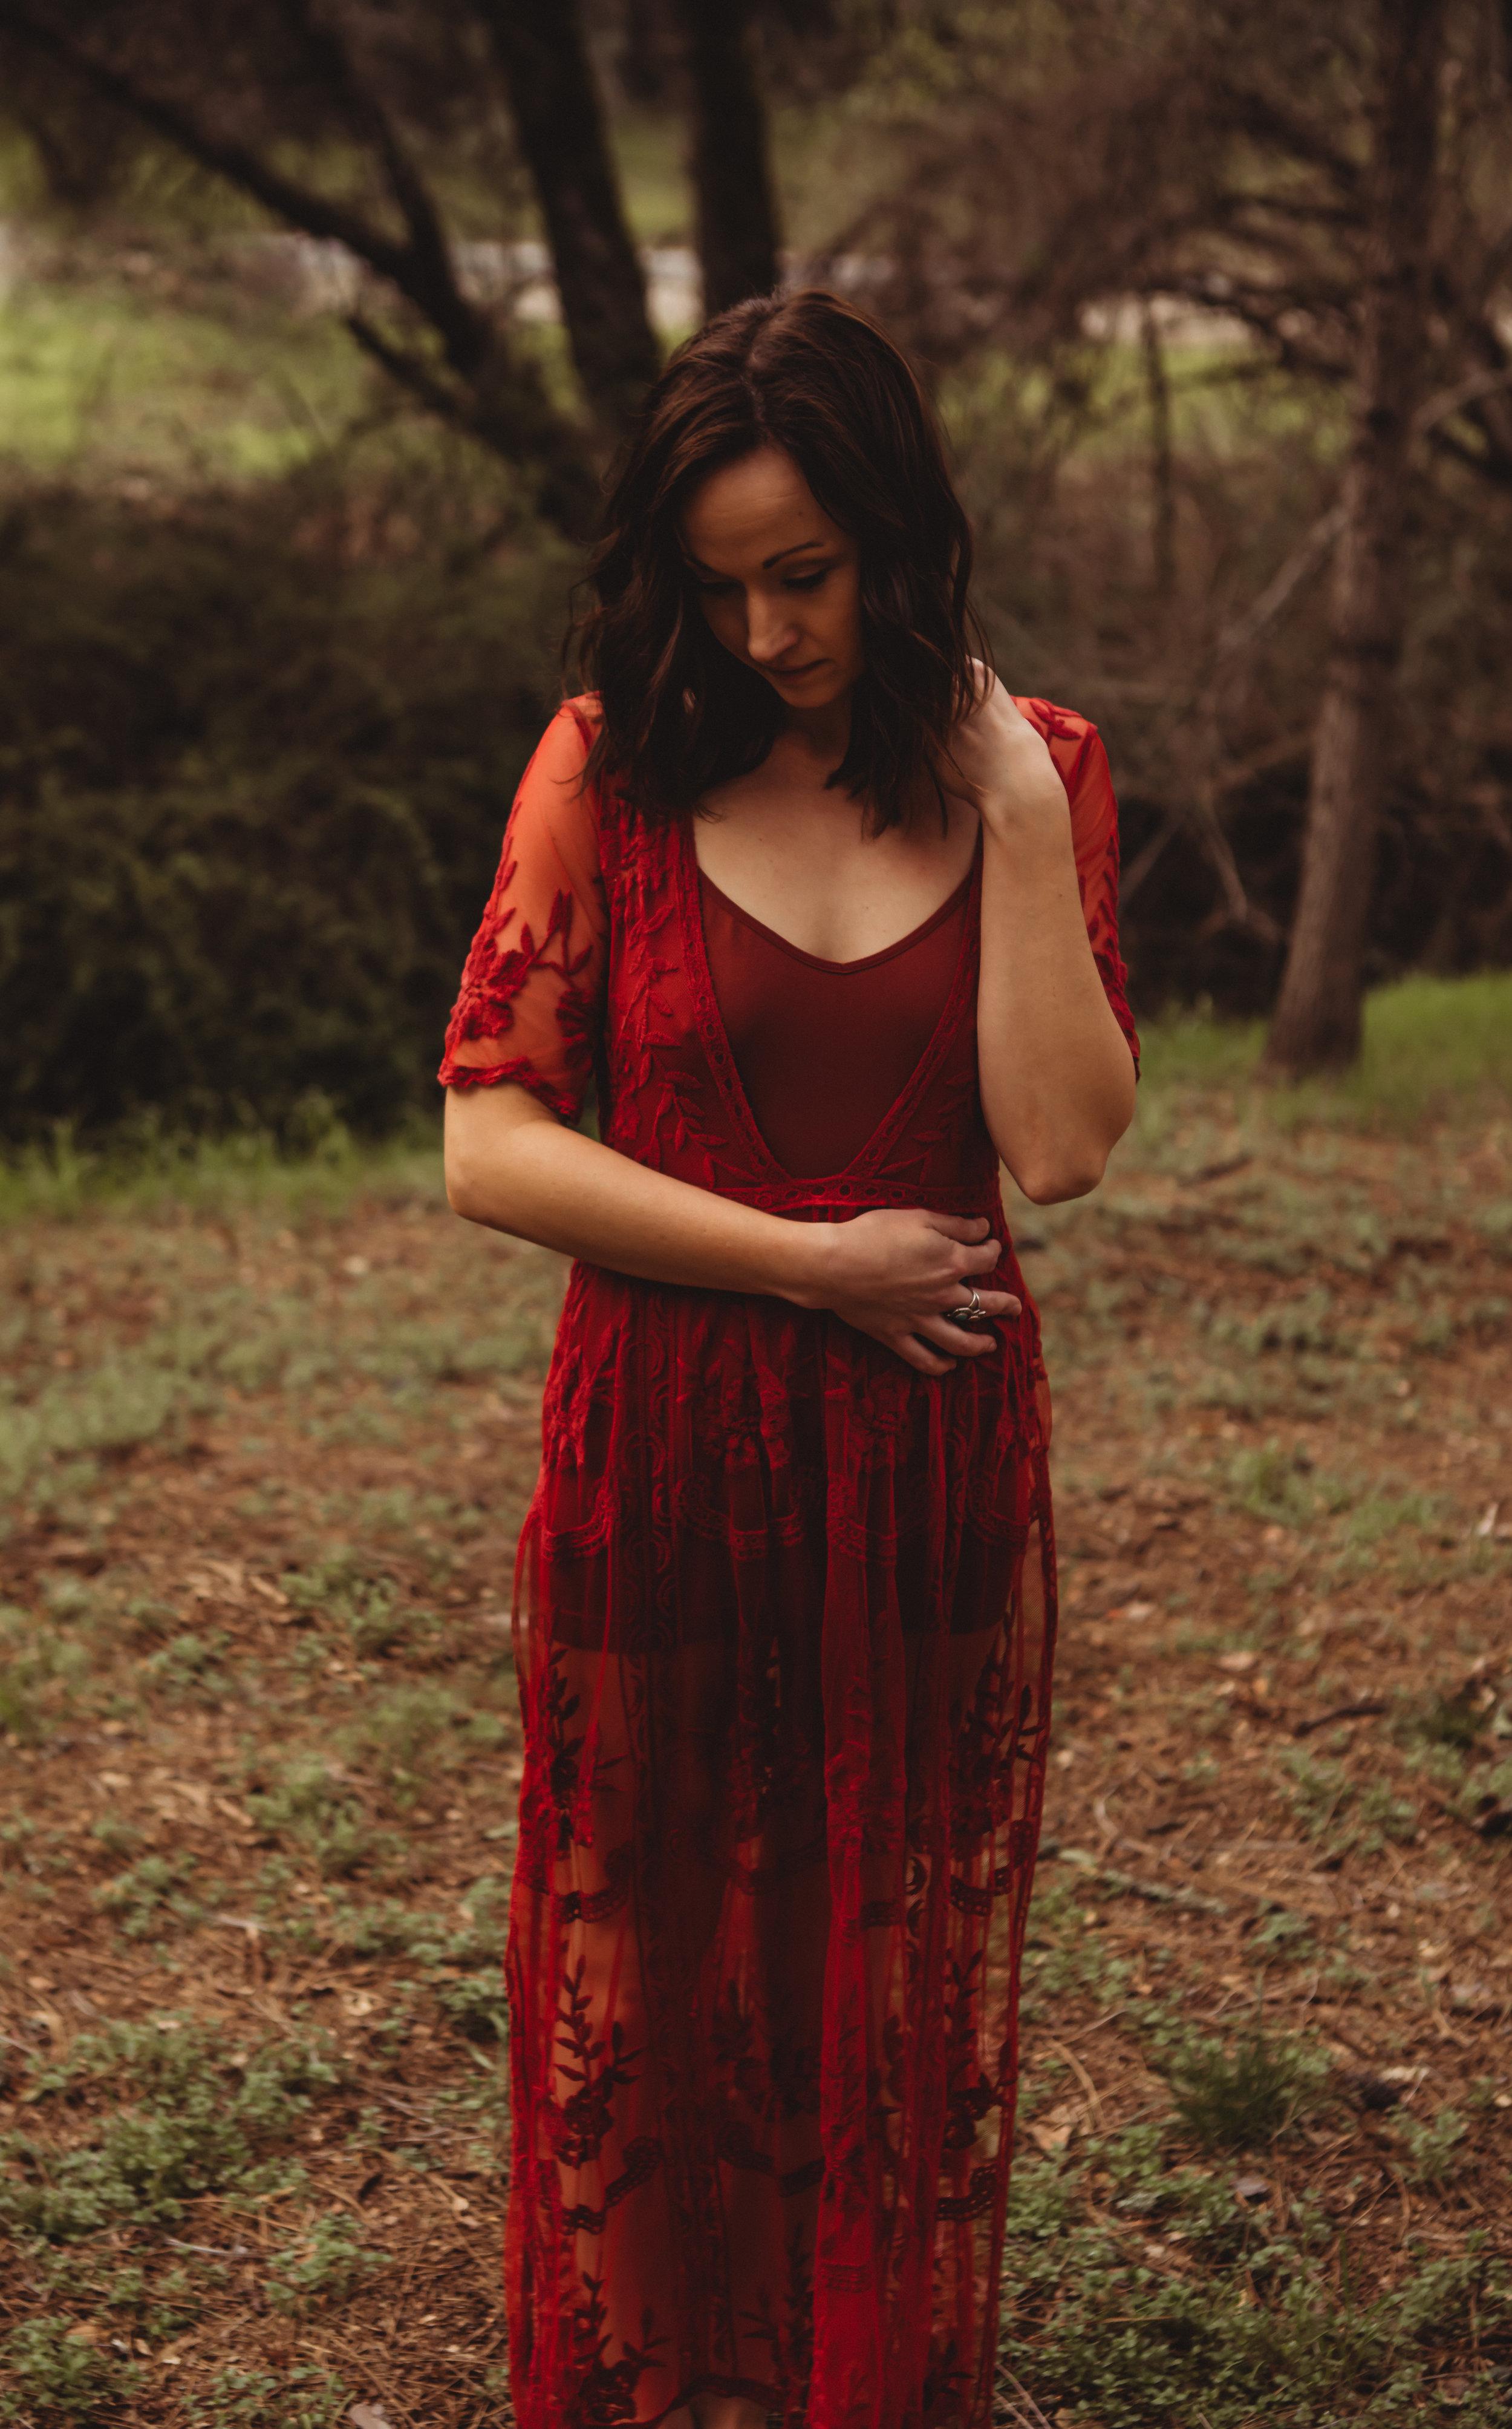 Alder Dress in Red    Size L fit M-Xl